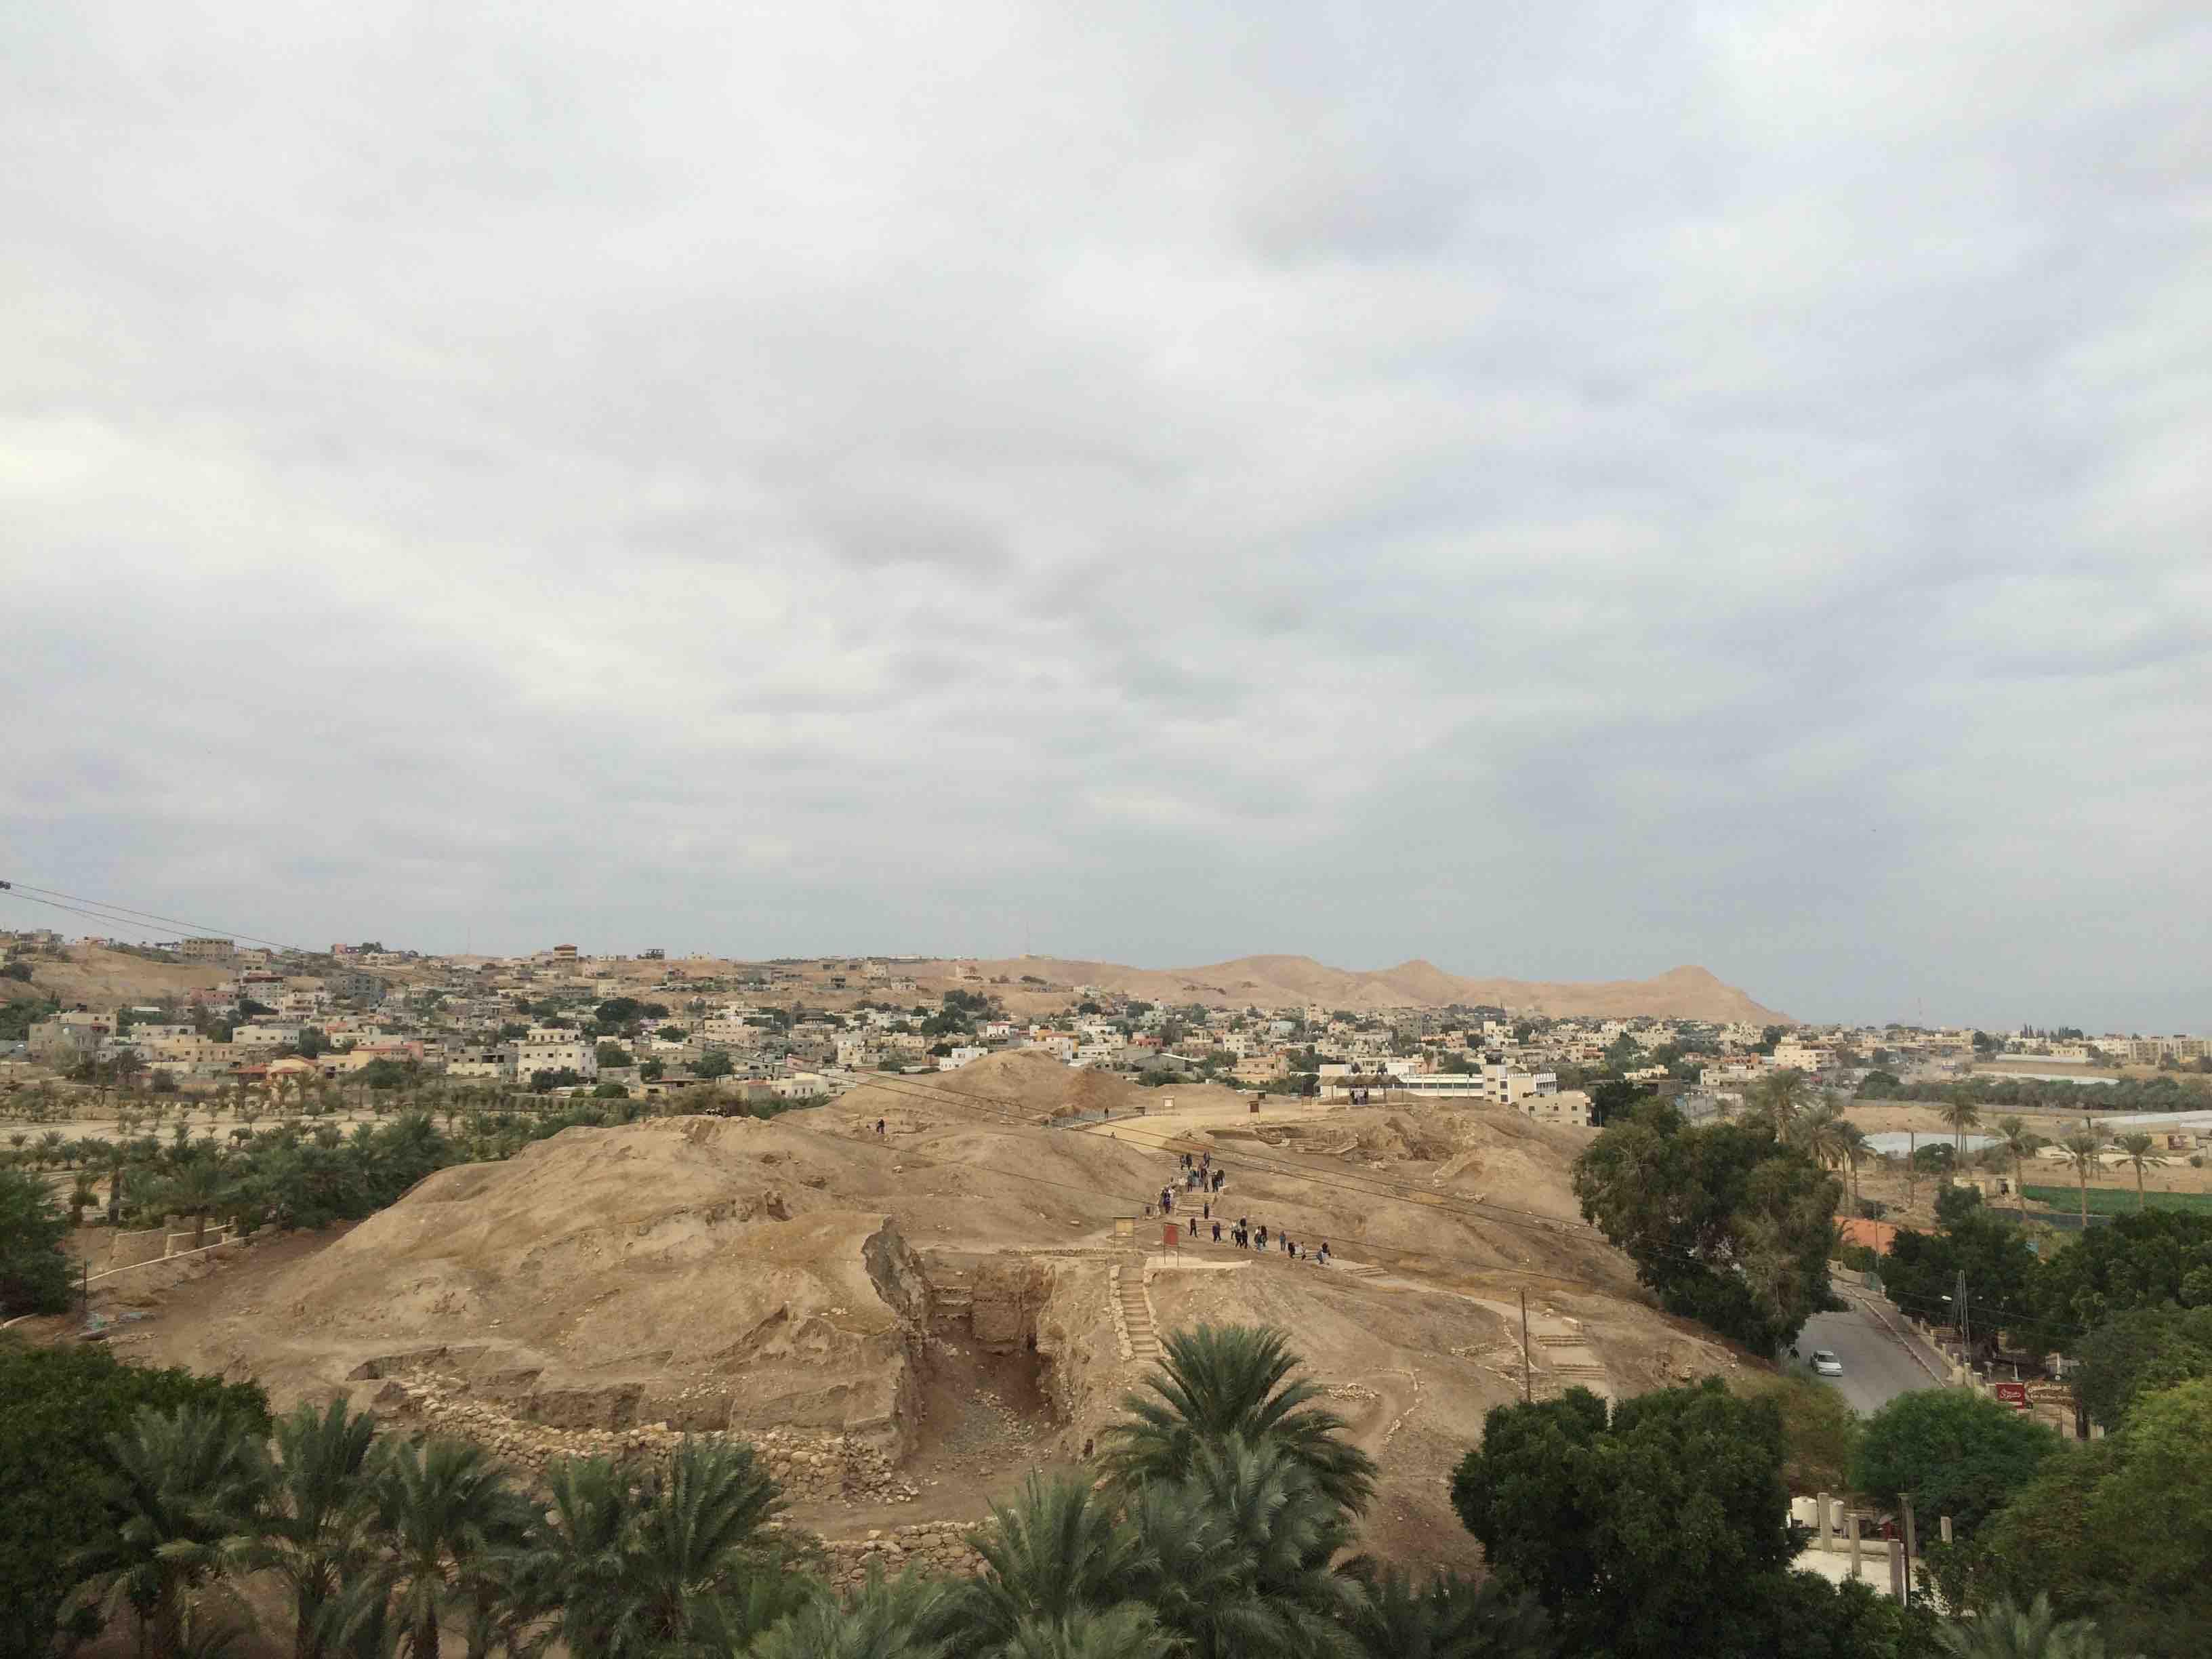 tel-al-sultan-jericho